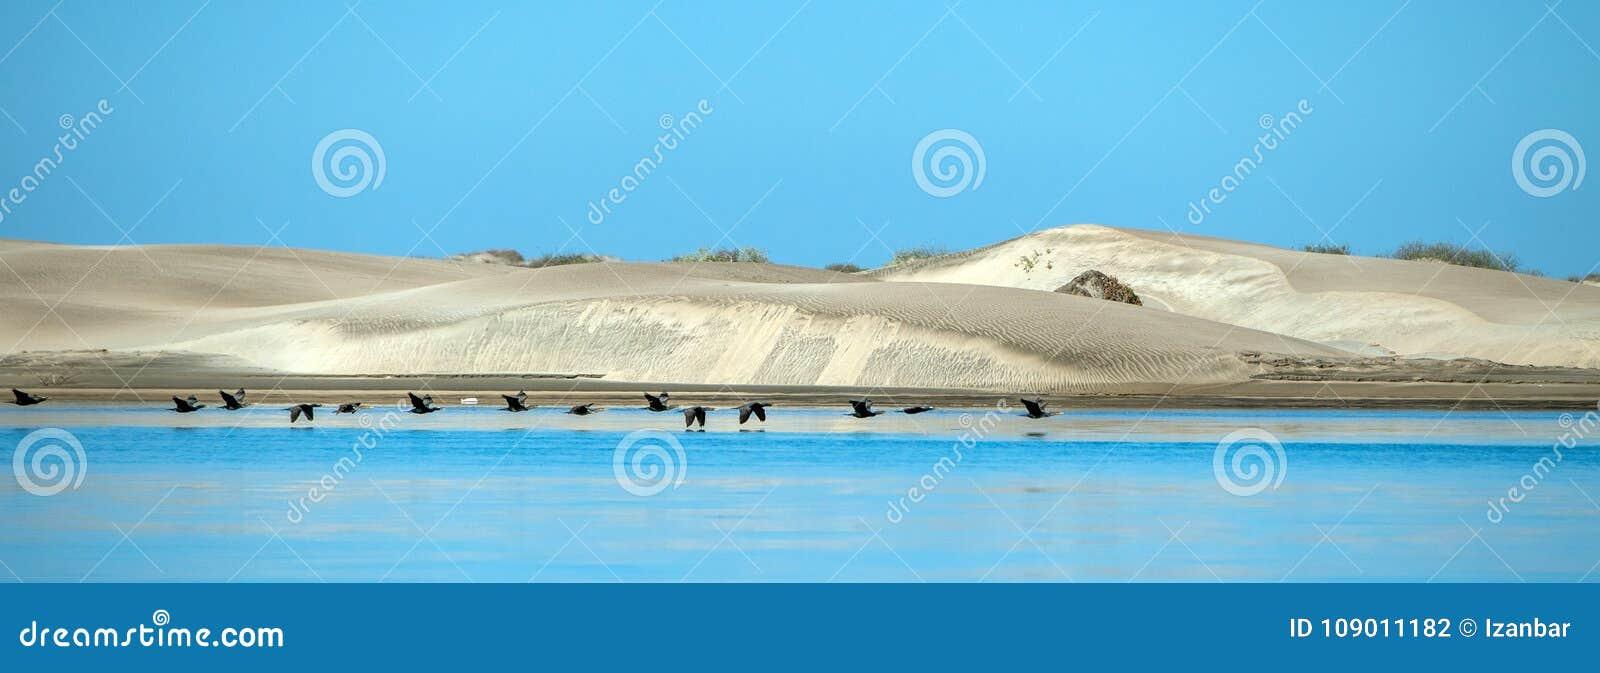 Kormoranvögel setzen Sanddünen in Kalifornien Magdalena Bay Mexiko auf den Strand